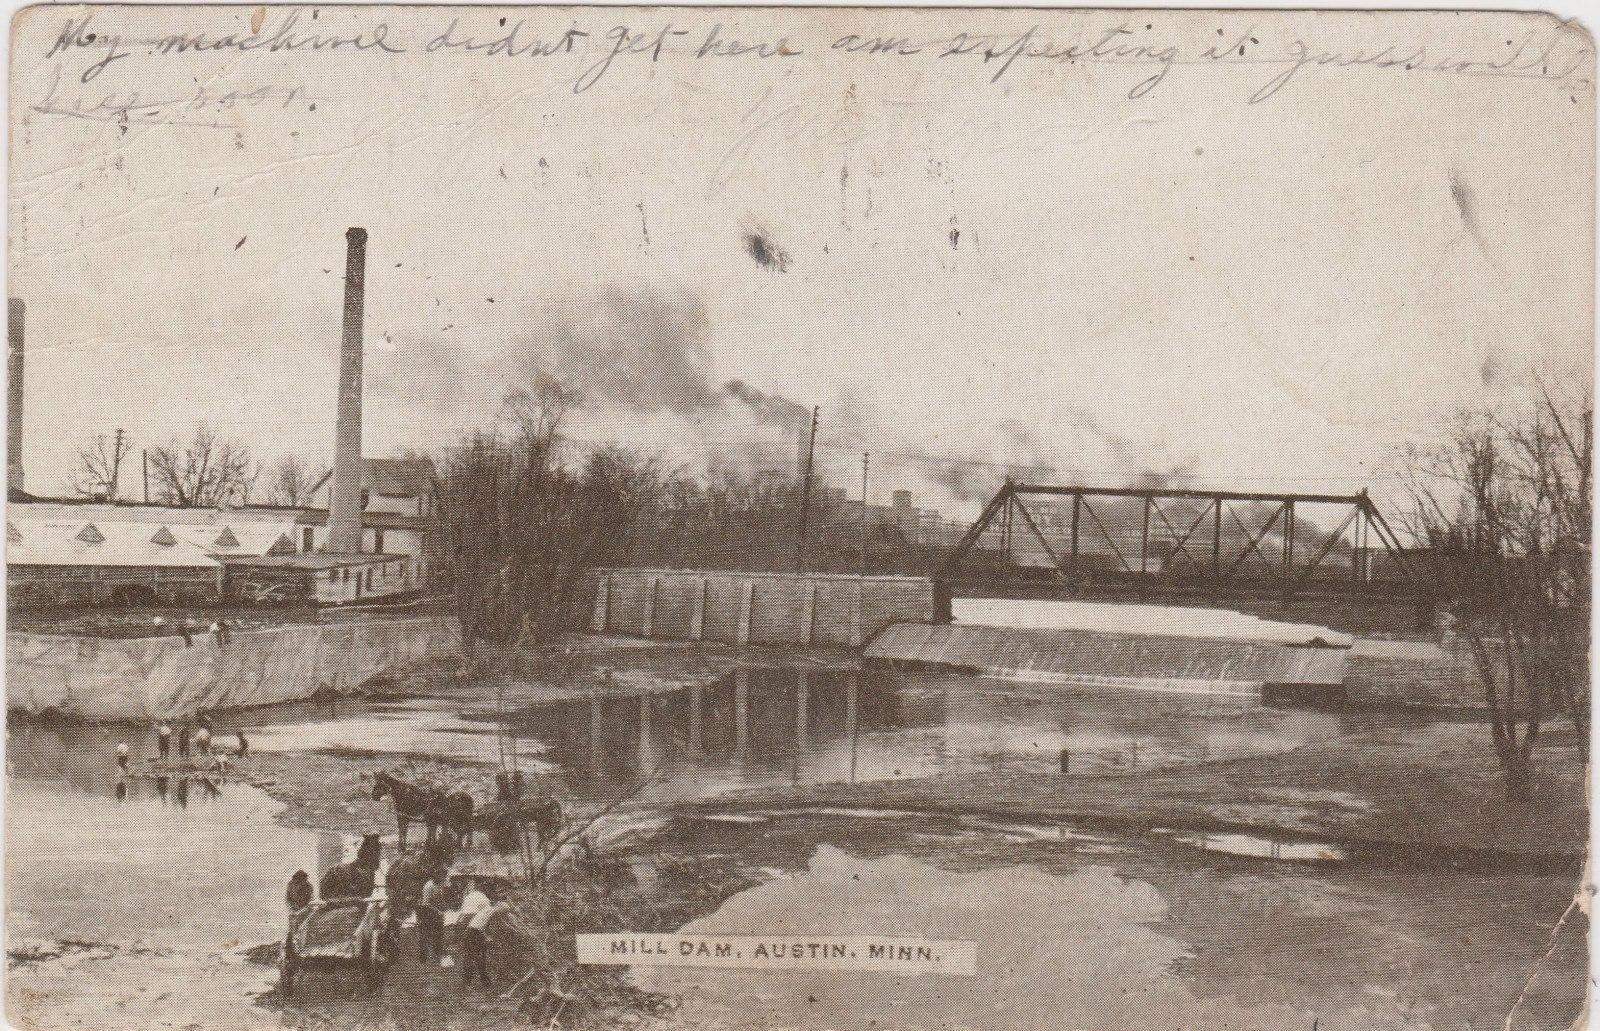 1910 Water Street Bridge